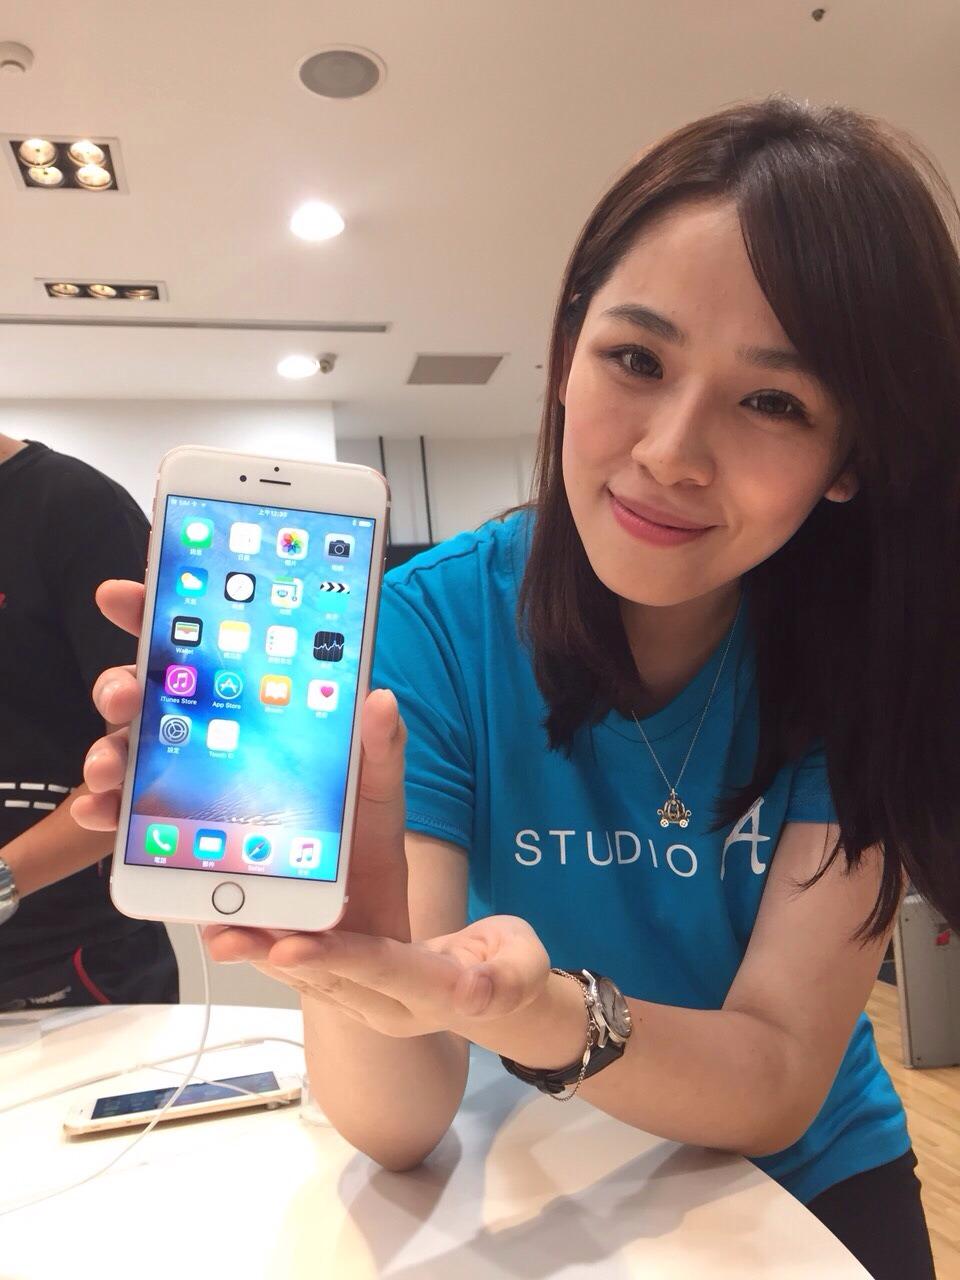 iPhone 6s/6s Plus銷量翻4倍  陸客陸生瘋搶買 現省4千元價差